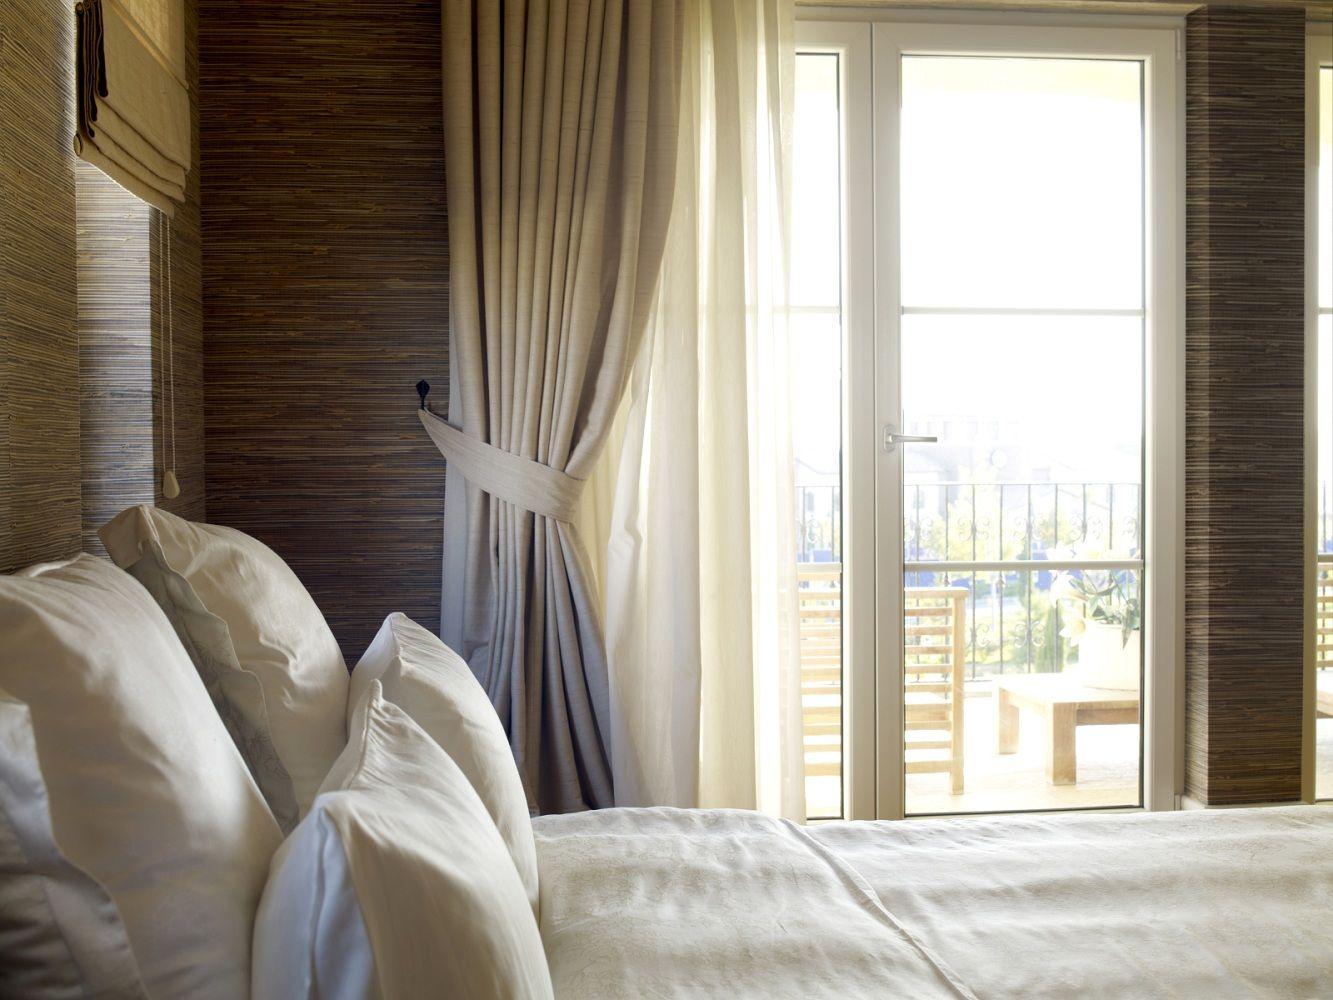 small window bedroom curtains | minimalist home design | pinterest